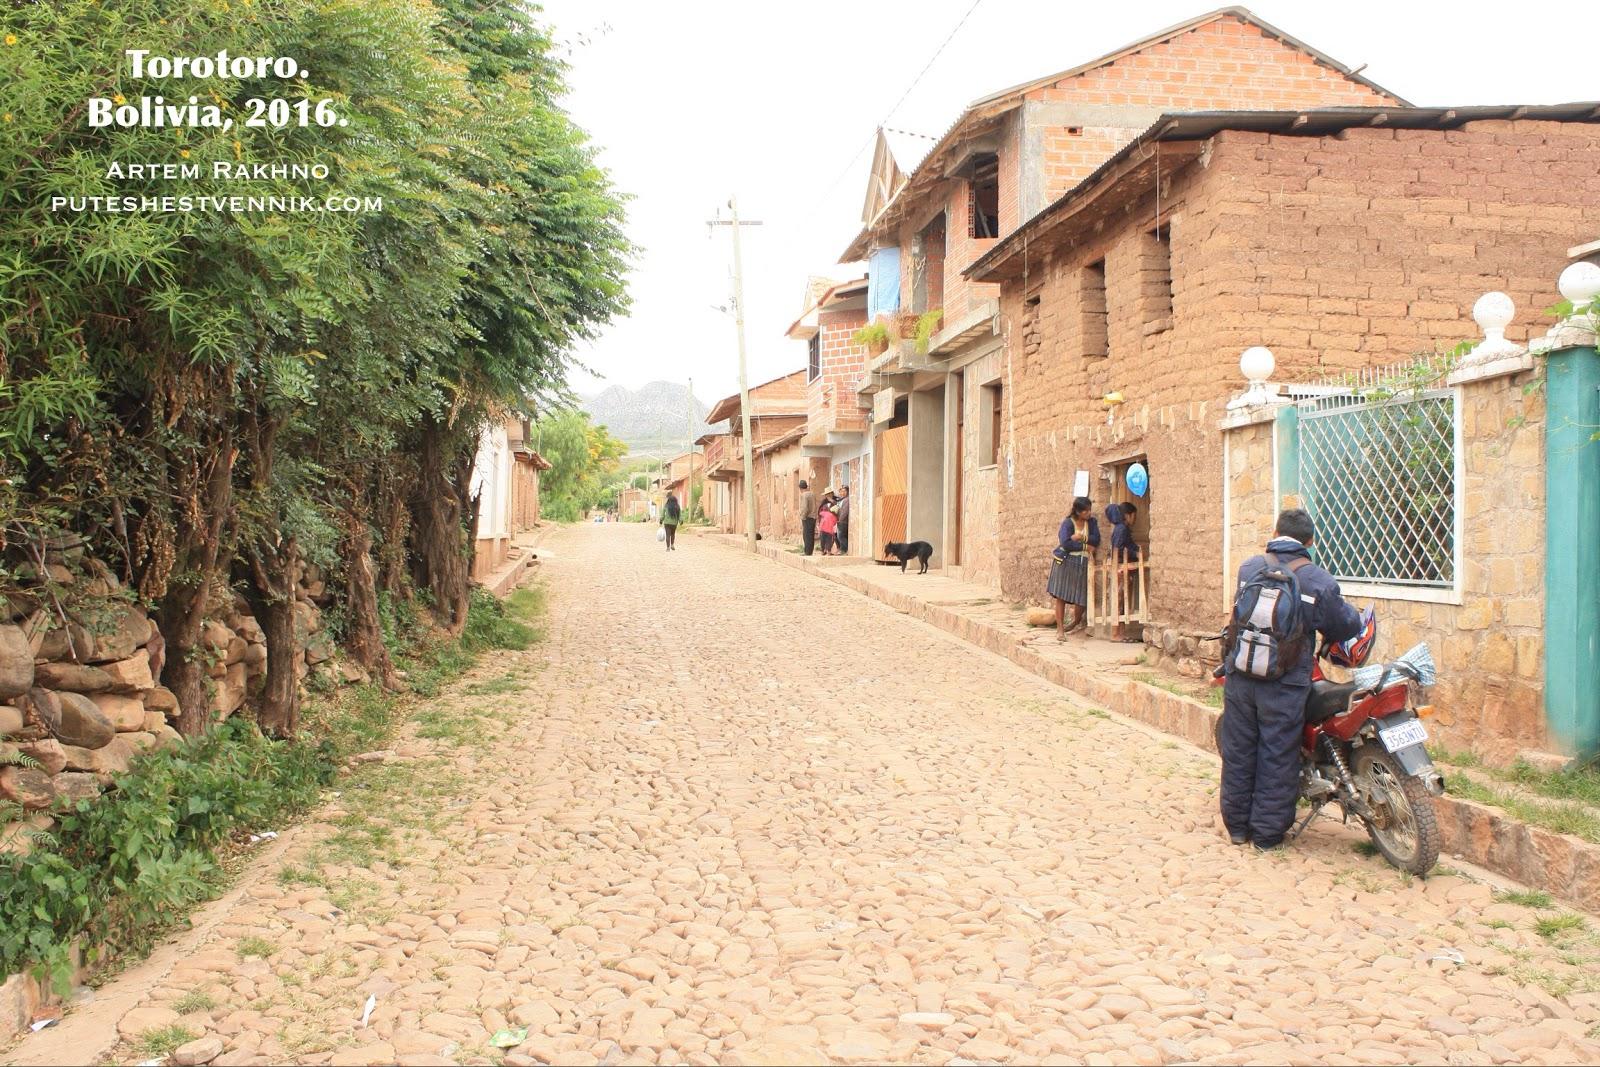 Мотоциклист в деревне в Боливии